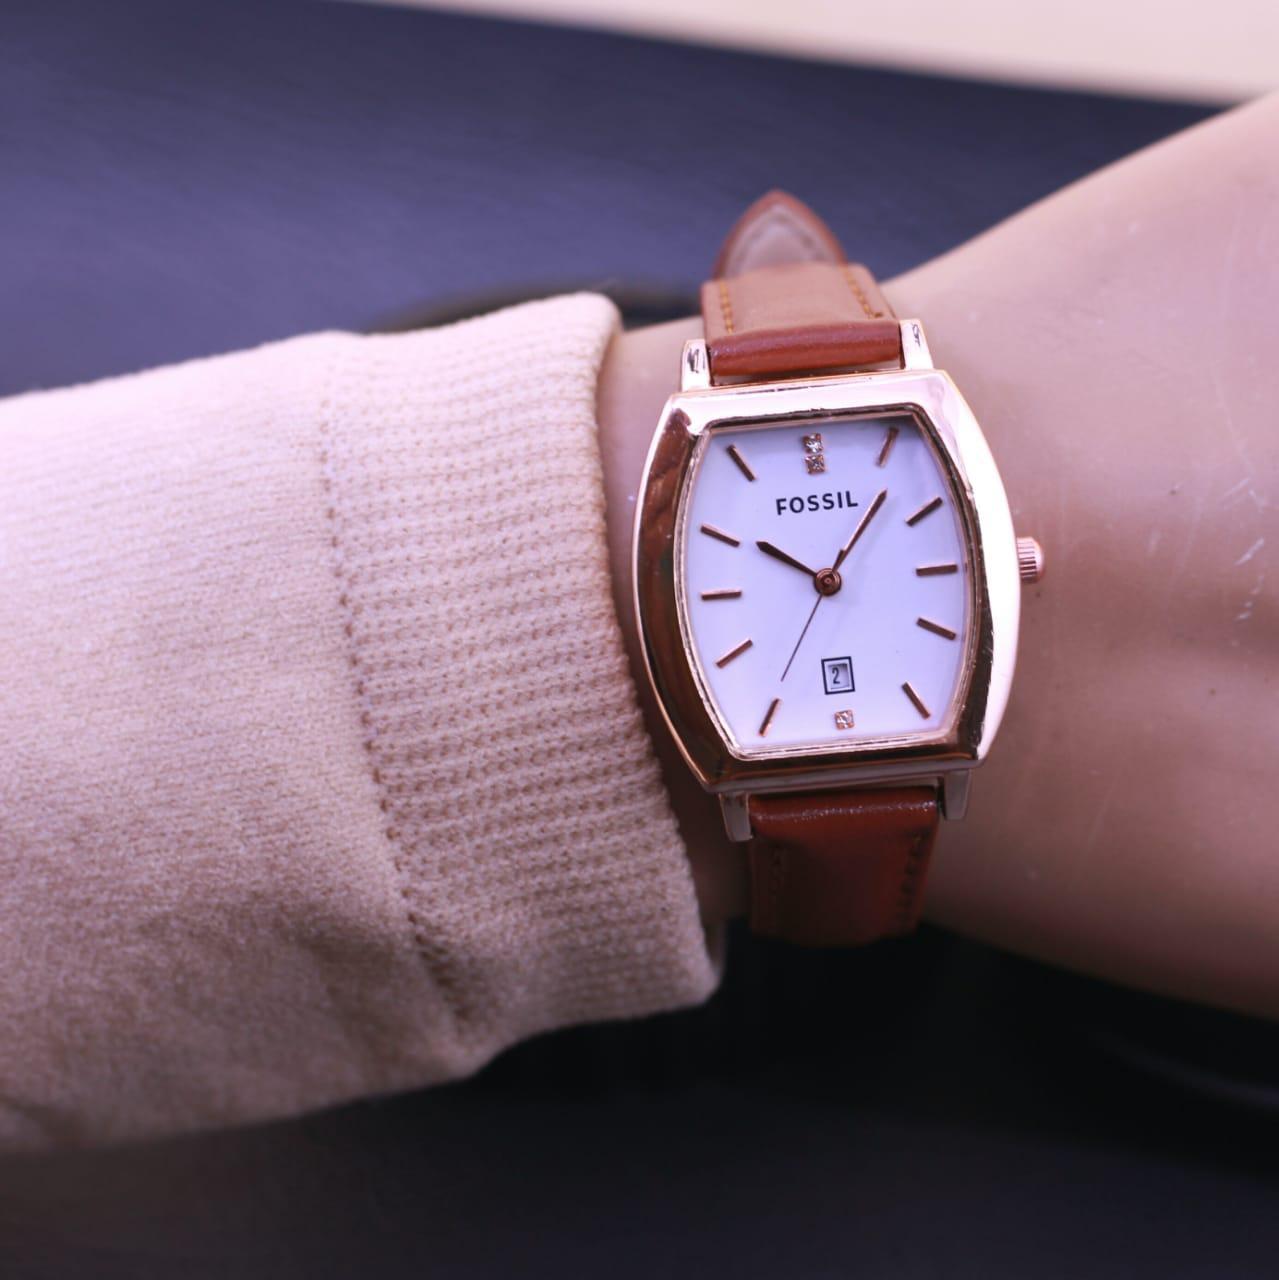 Jam Tangan Fashion Wanita Terbaru Fossil Fs772 77l Daftar Harga Perfect Boyfriend Multifunction Es4146 Detail Gambar Kulit Tgl Aktif